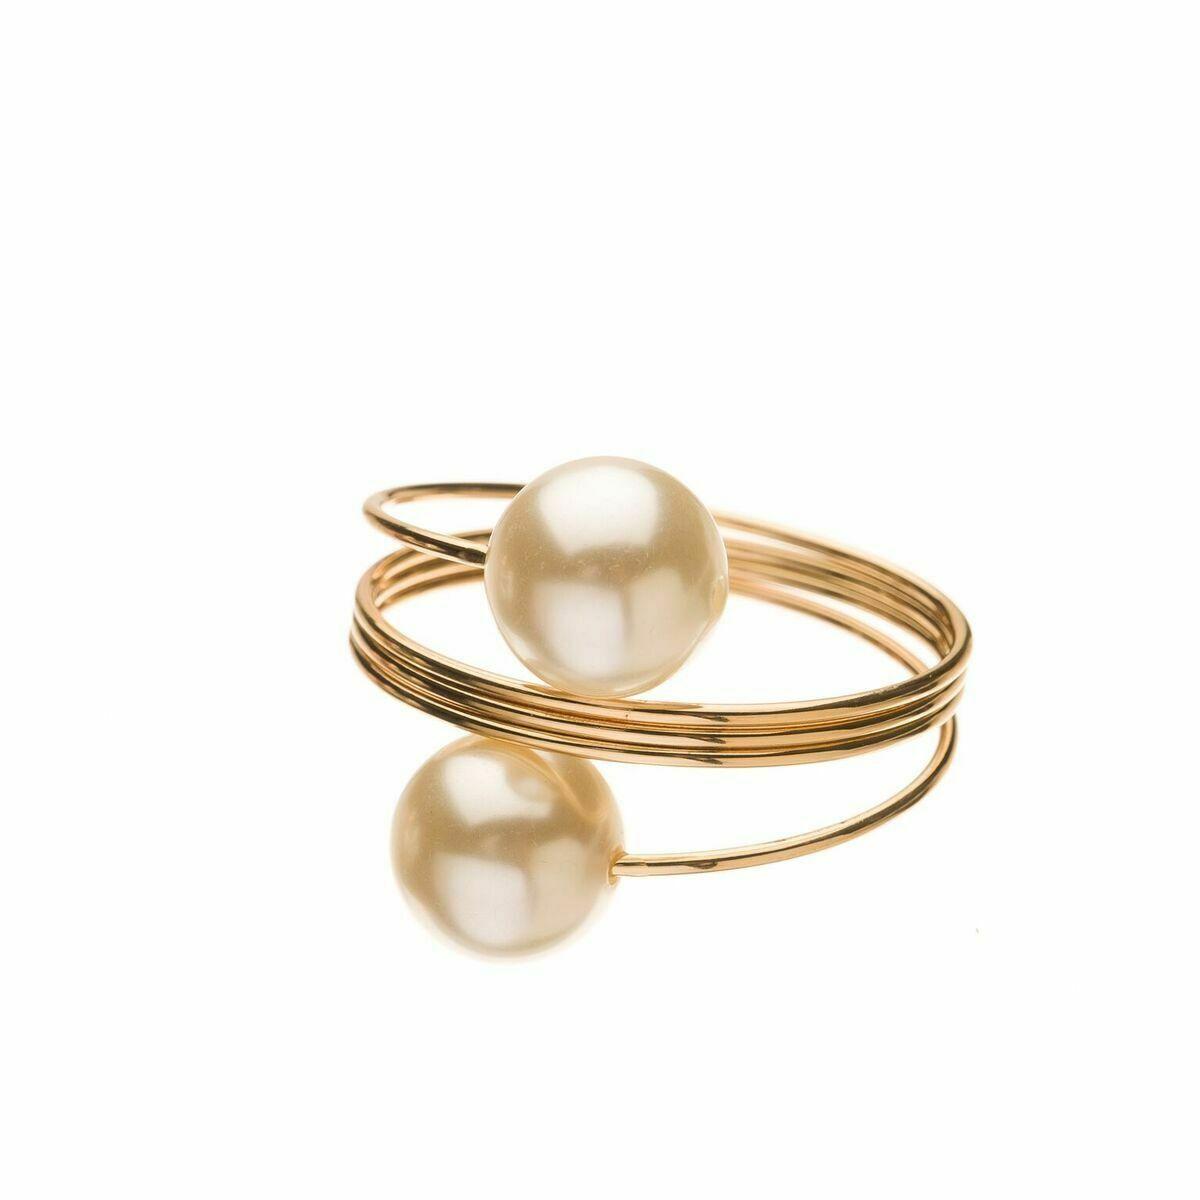 Napkins Pearl Napkin Rings 8pcs Napkin Ring Napkin Rings Wedding Dining Room Handmade Products